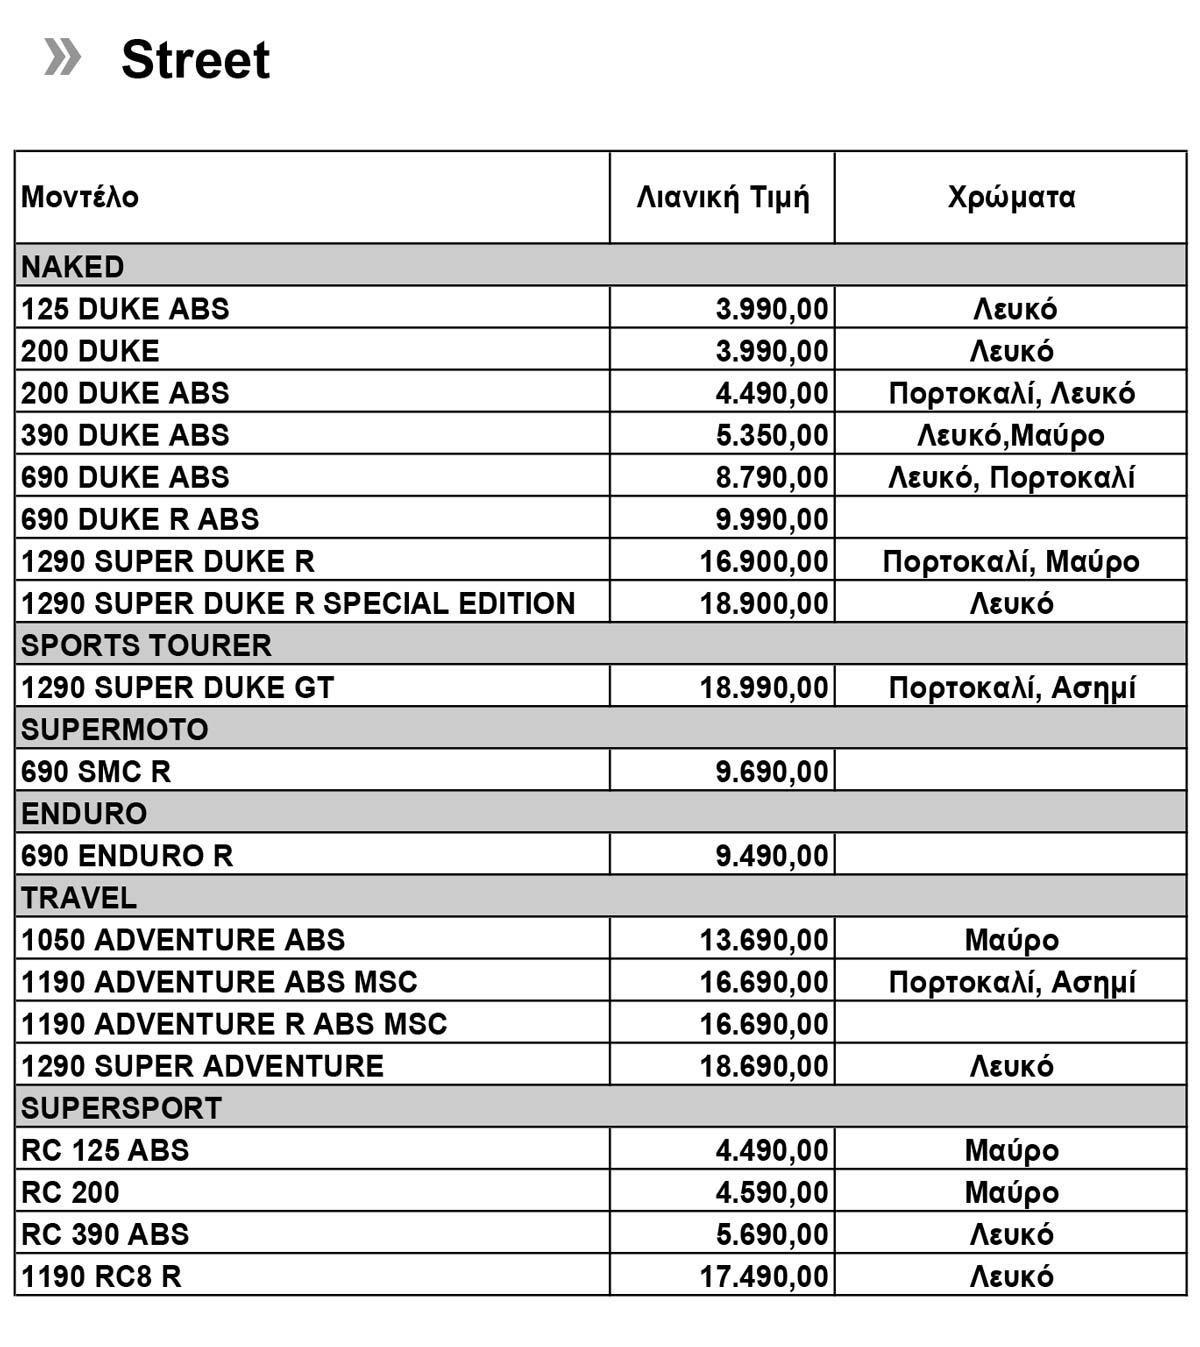 KTM-Retail-Pricelist_2016_01_12_2015-2